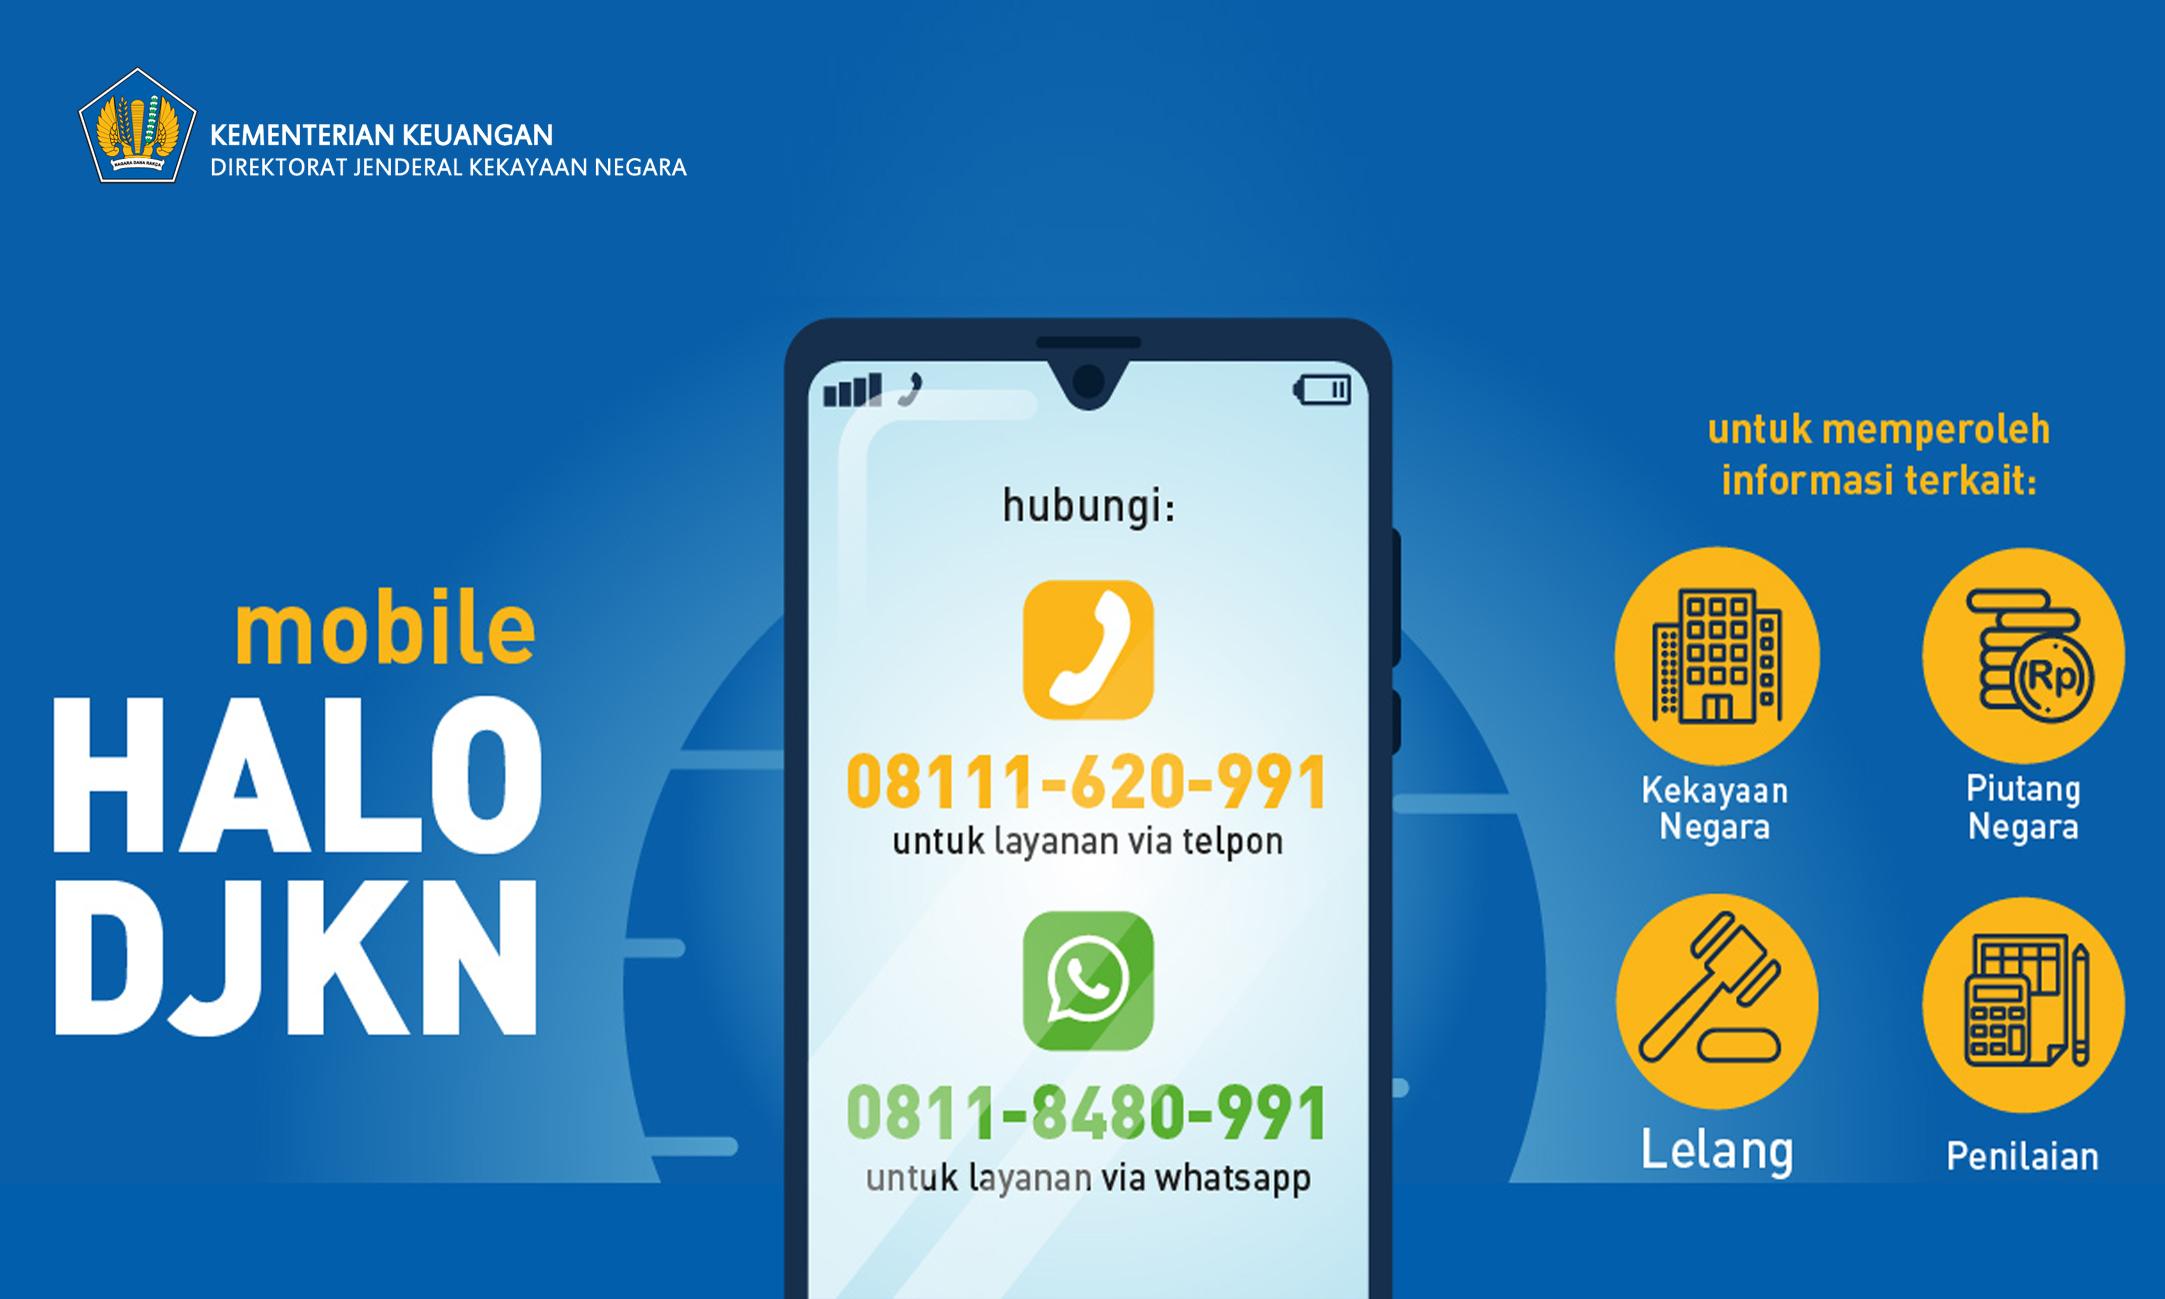 Layanan Mobile HALO DJKN